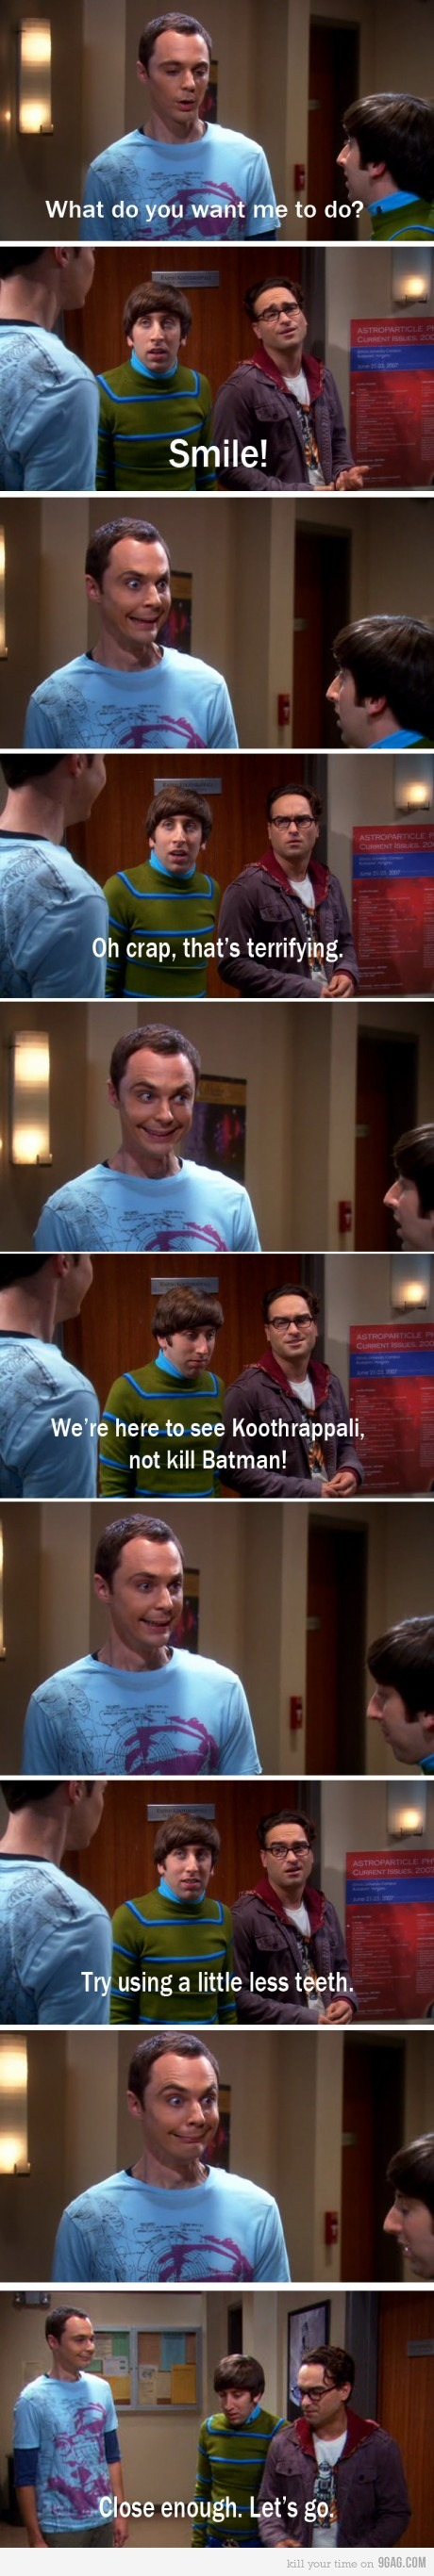 Smile, Sheldon!